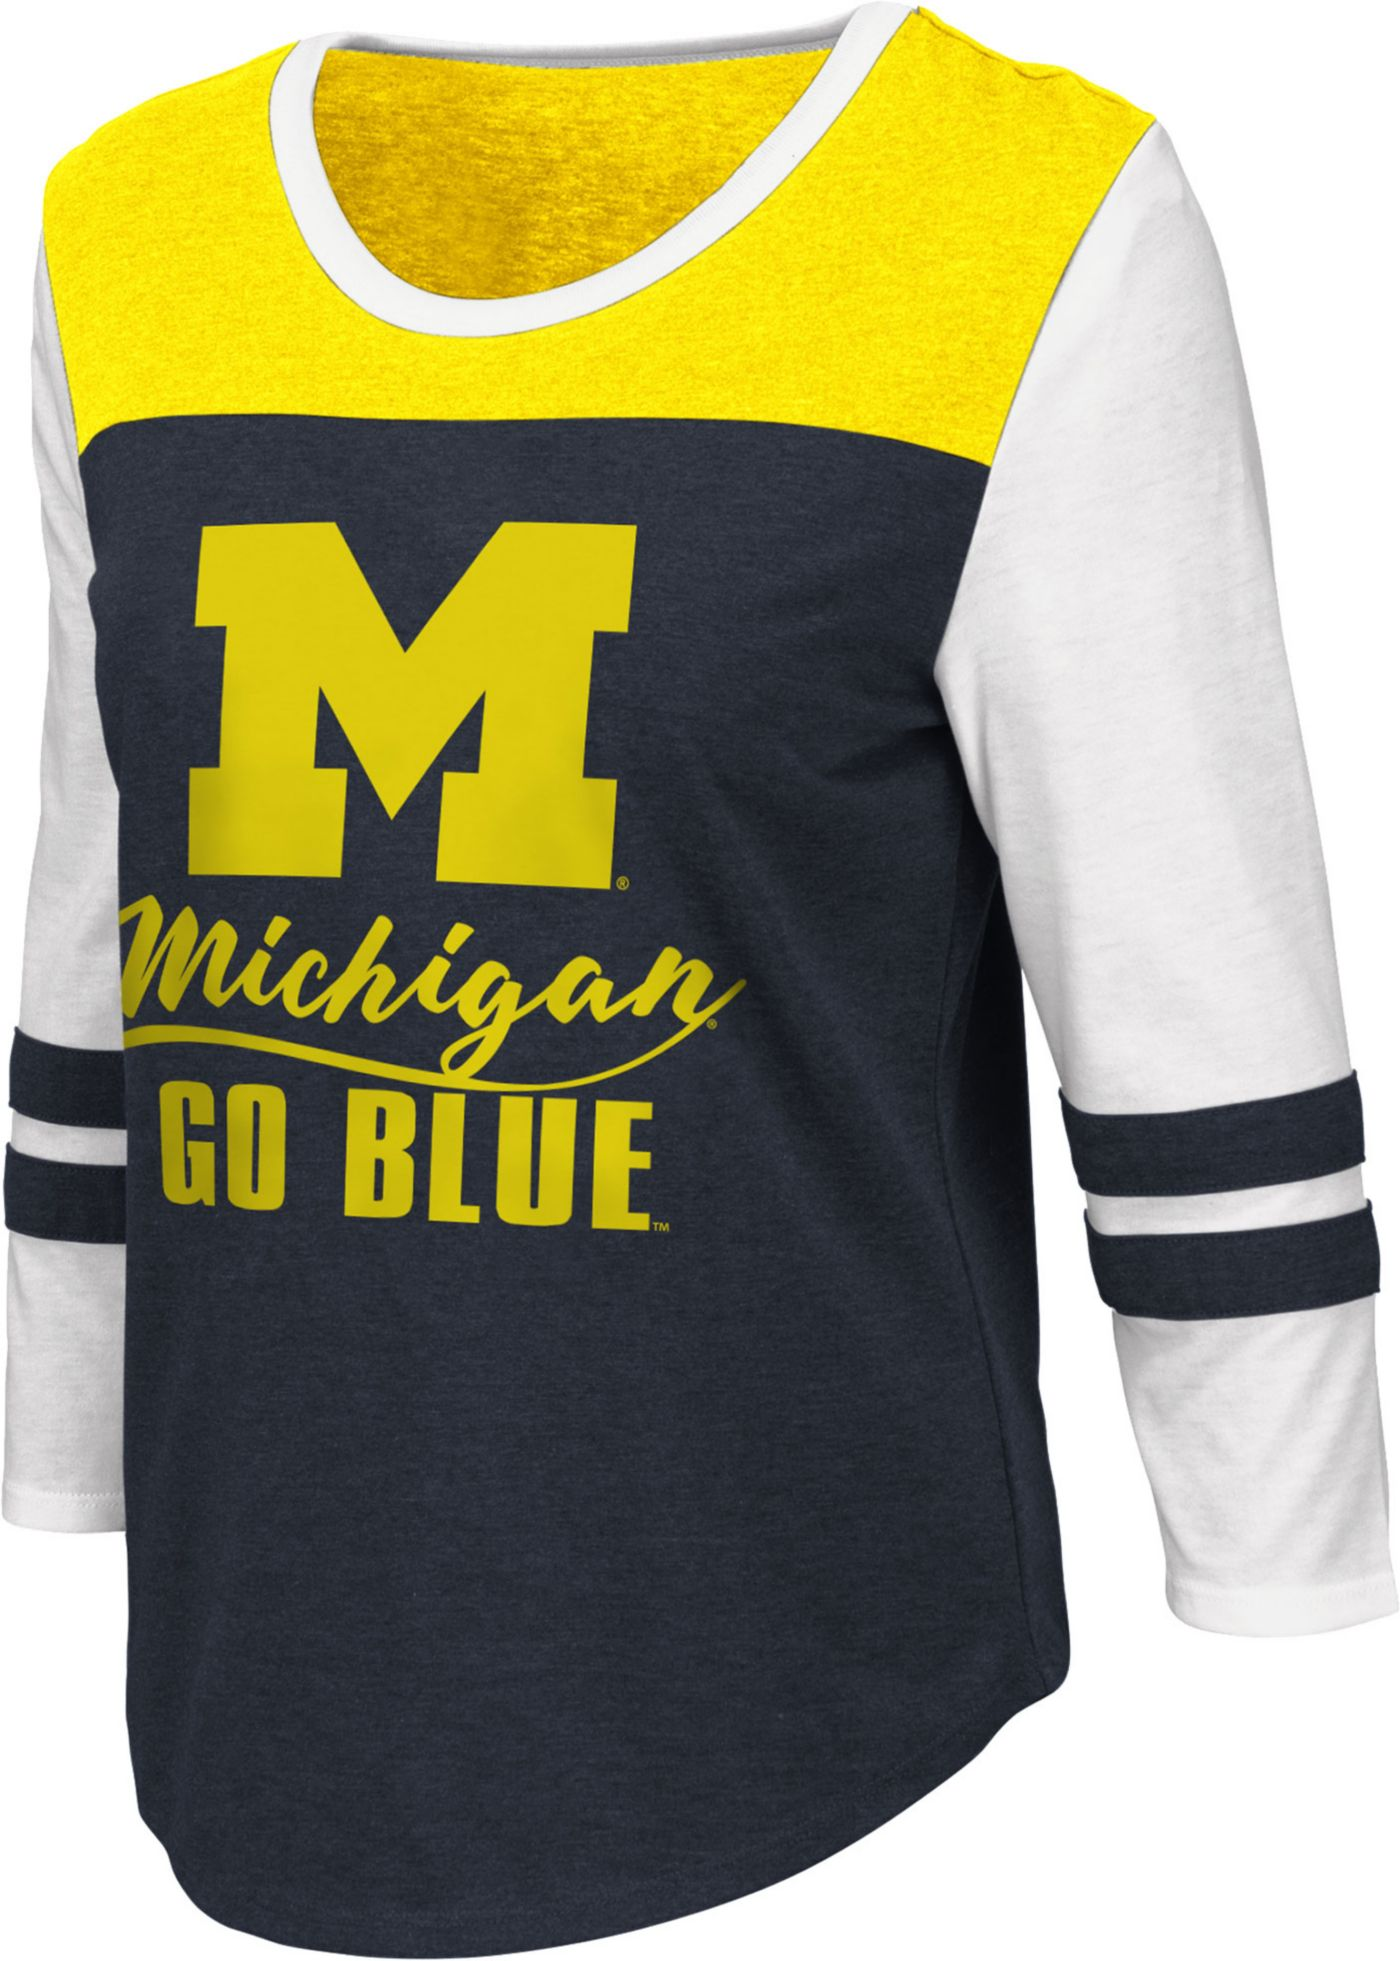 Colosseum Women's Michigan Wolverines Blue ¾ Sleeve Raglan T-Shirt